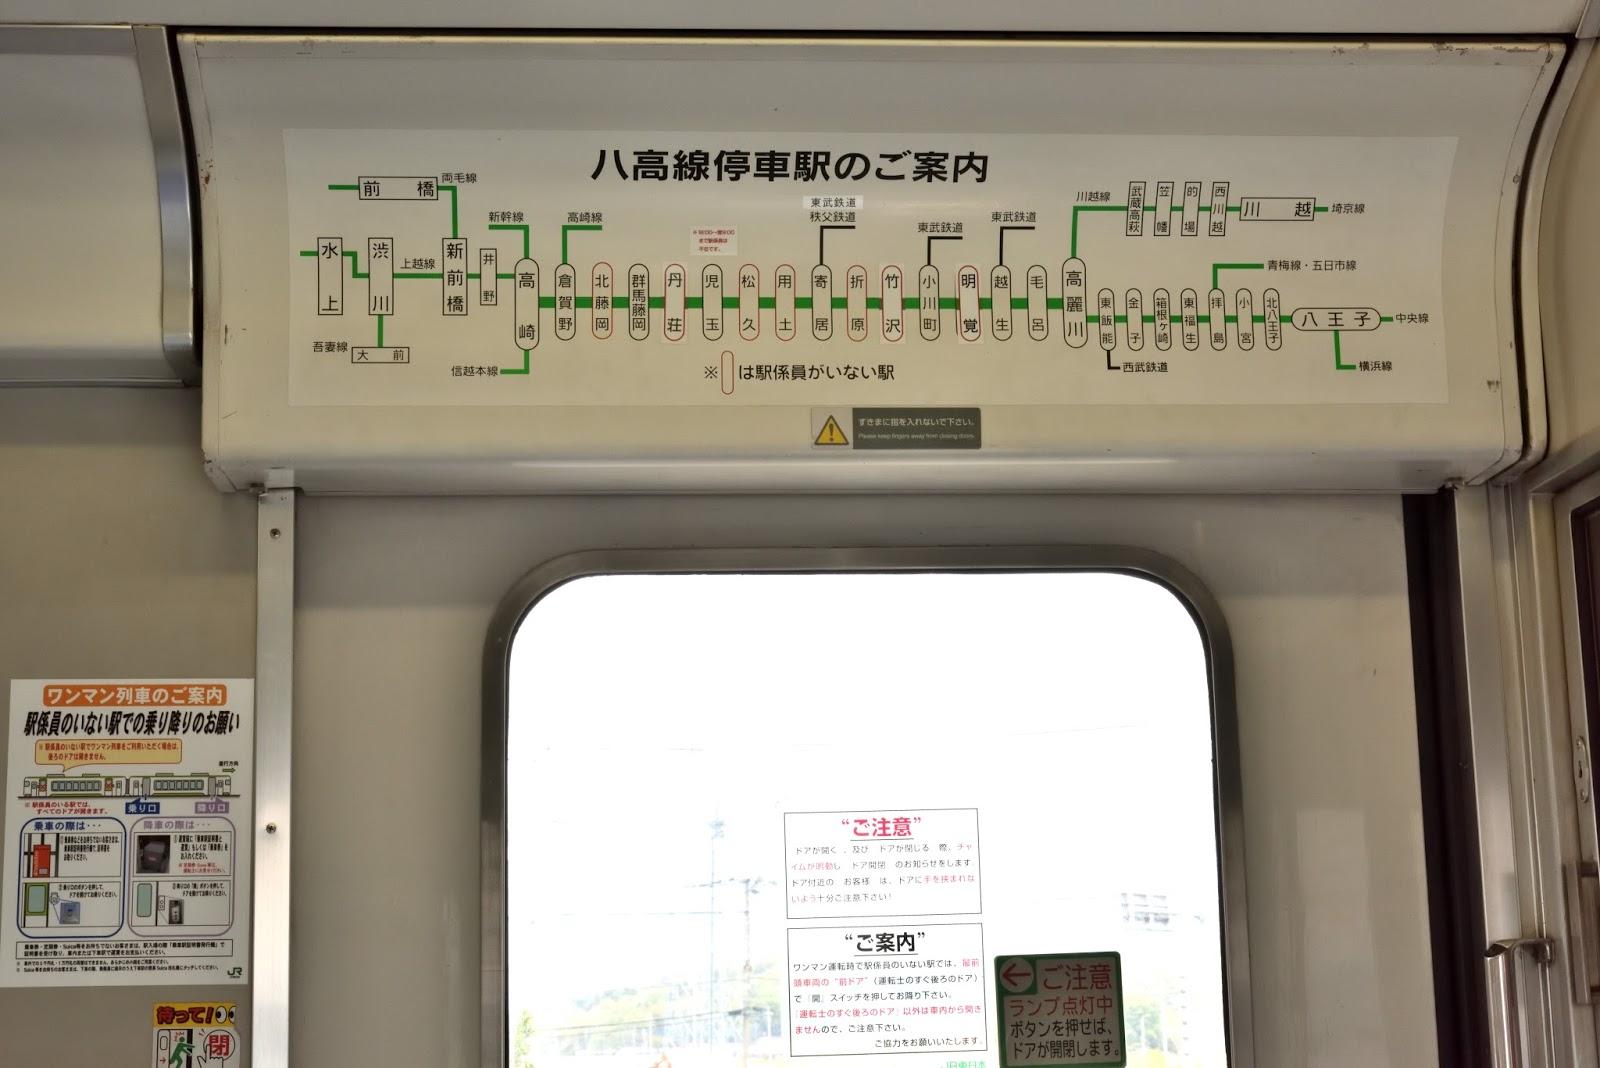 JR東日本キハ110系気動車八高線 路線図. JR East Kiha 110 series Diesel Car Route map of the  Hachiko line